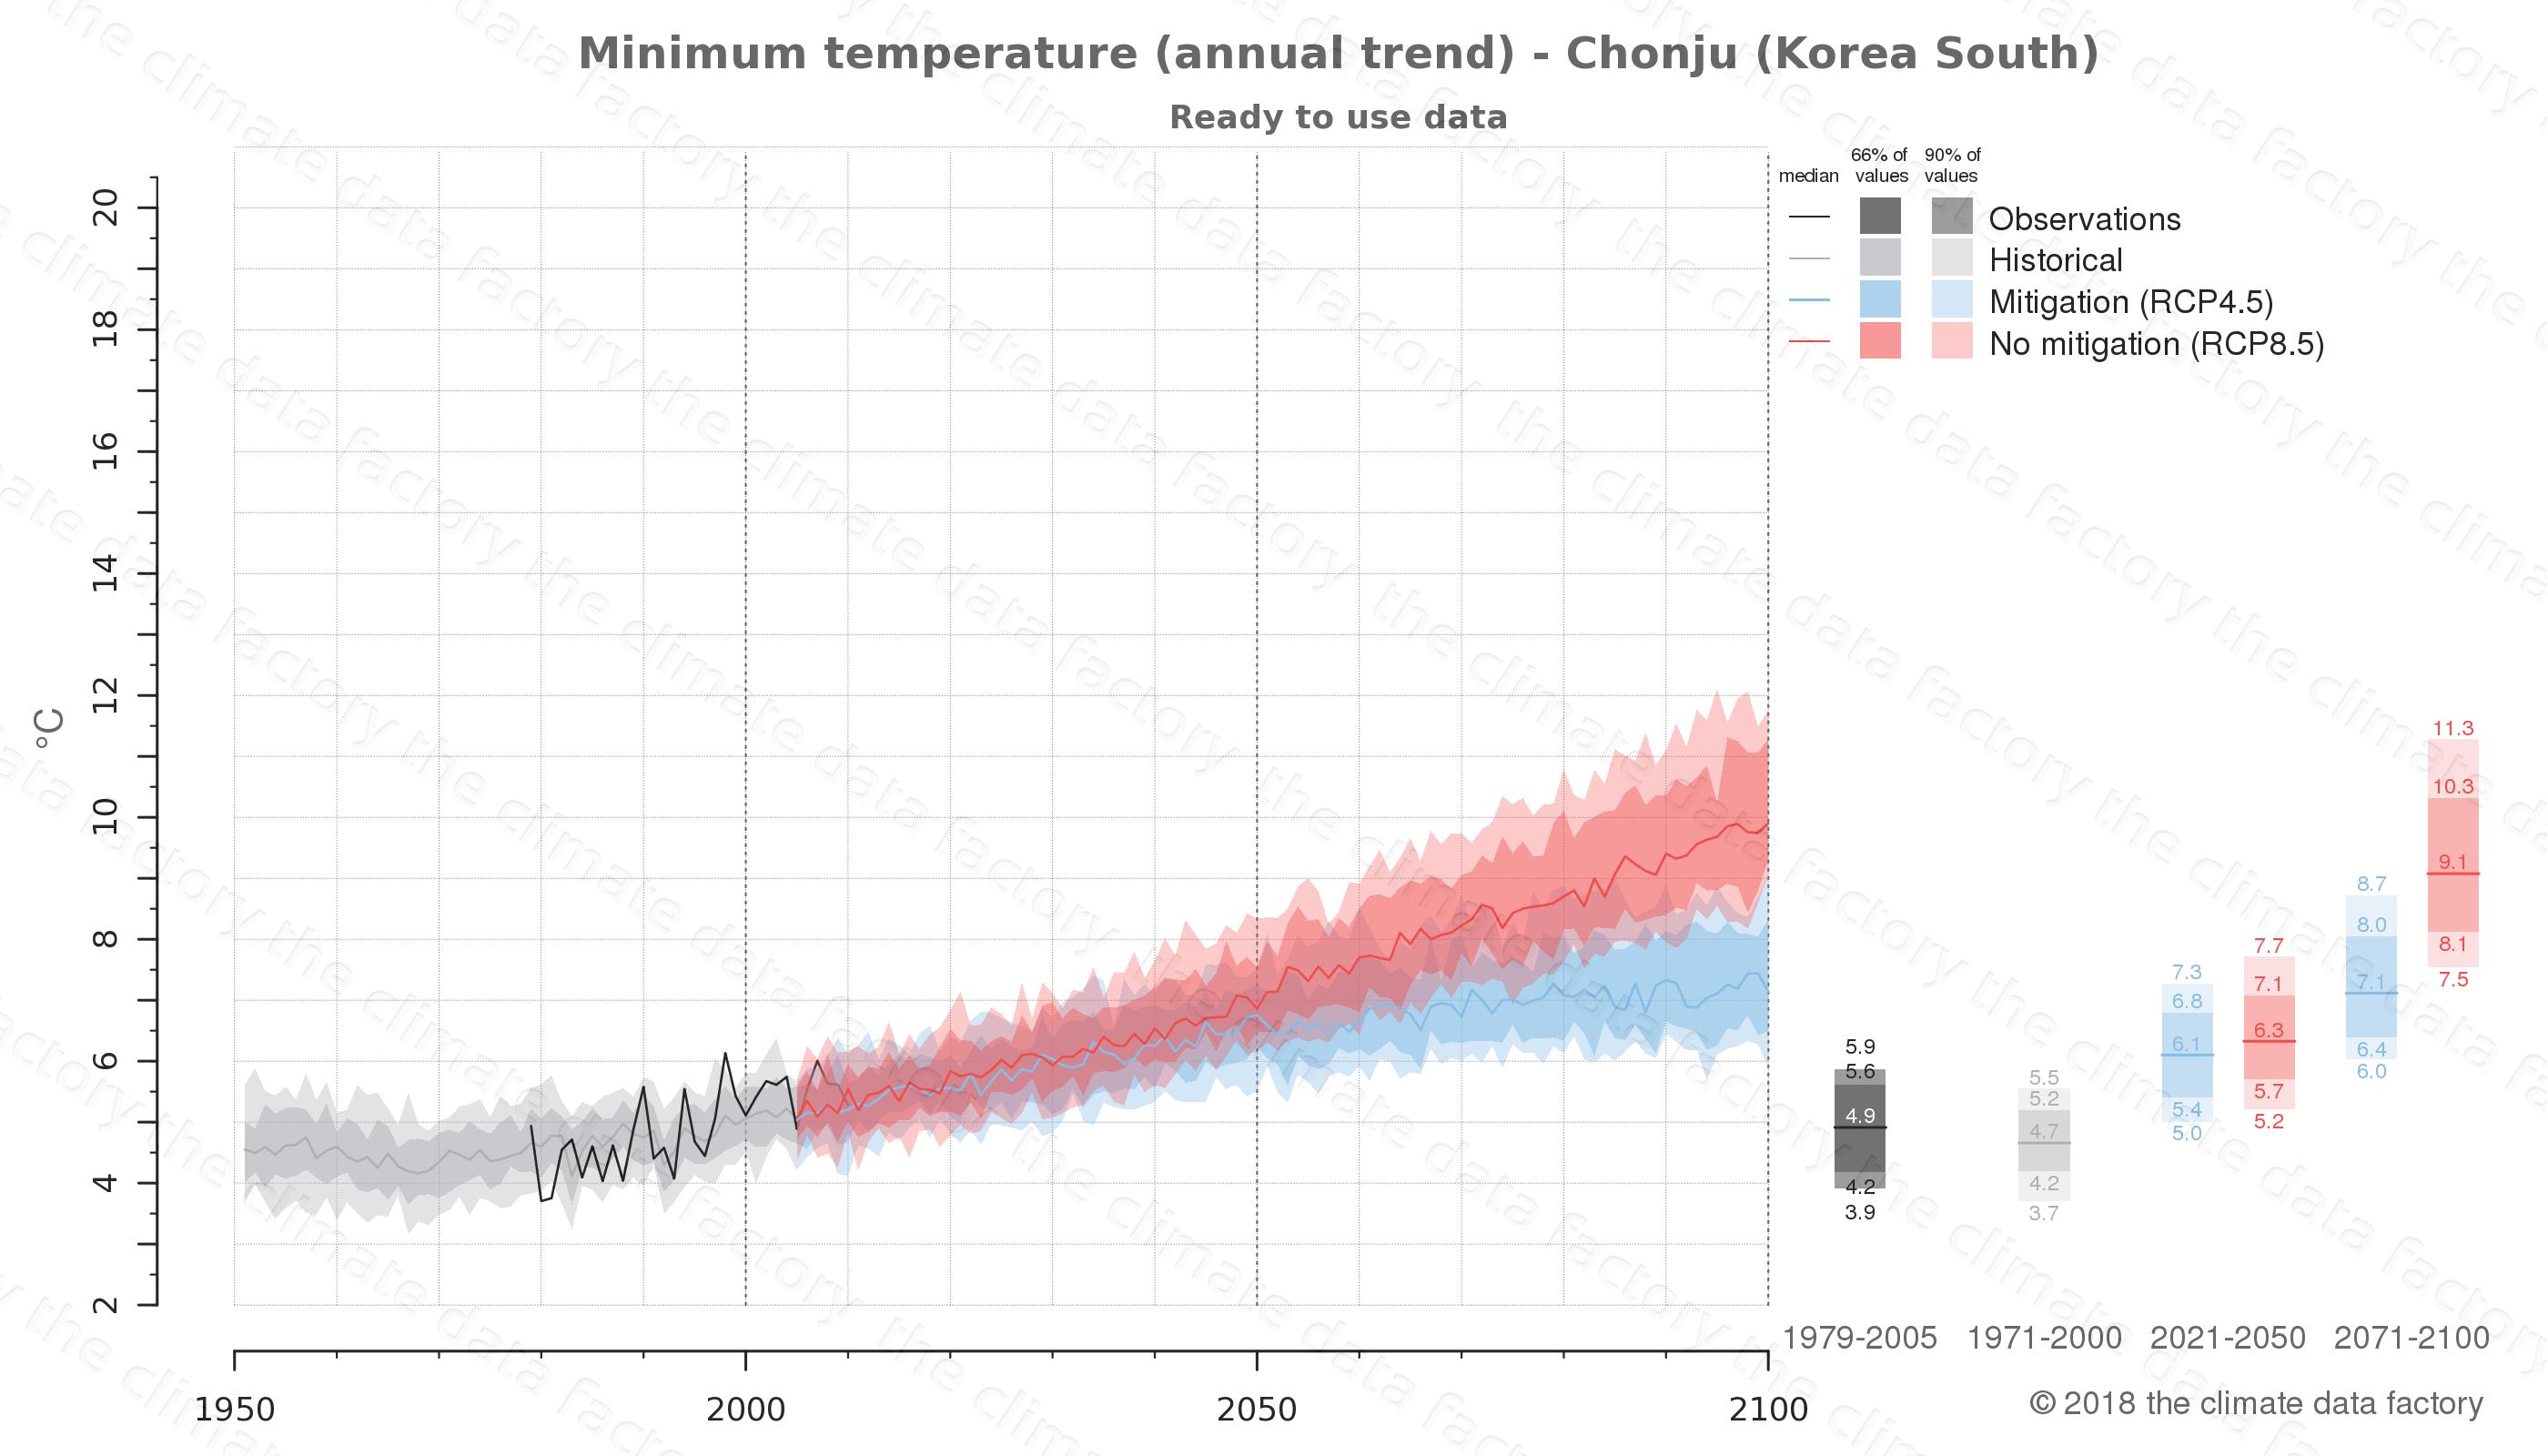 climate change data policy adaptation climate graph city data minimum-temperature chonju south korea